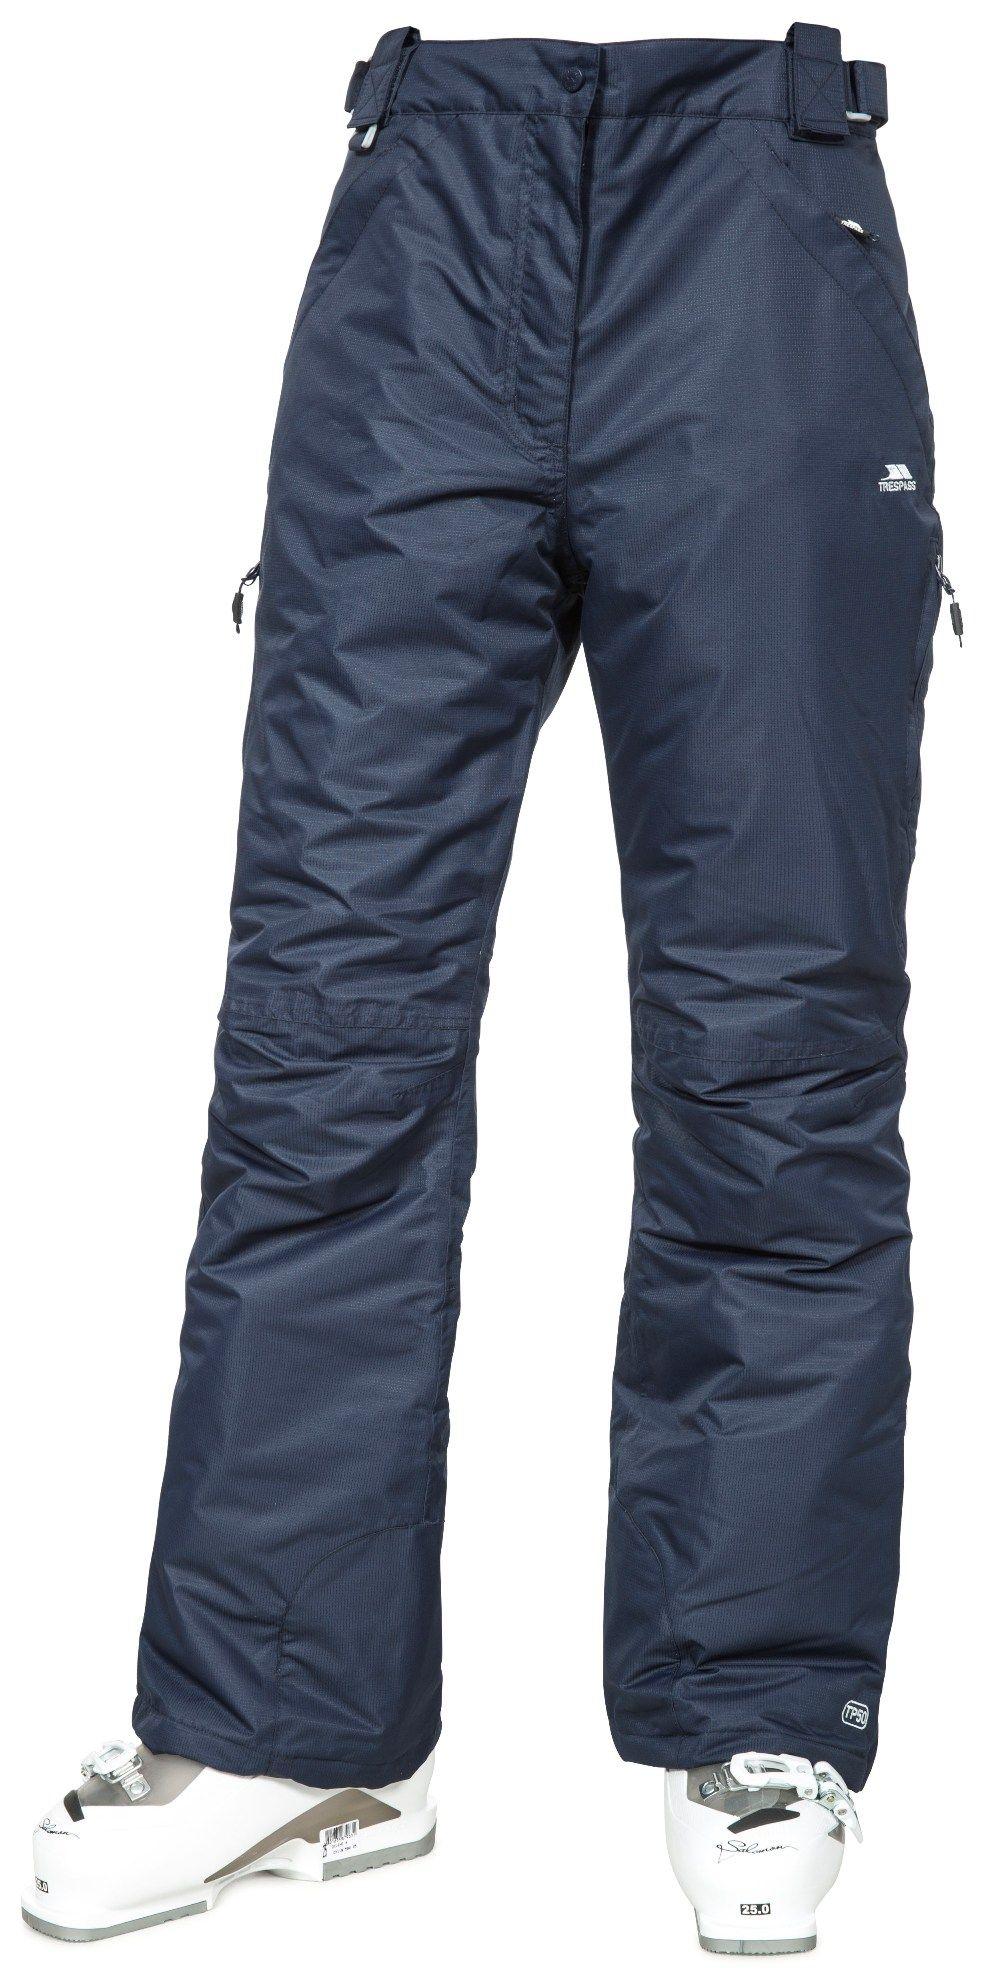 Trespass Lohan Womens Ski Pants (Navy) - Wow Camping f0034b6b7